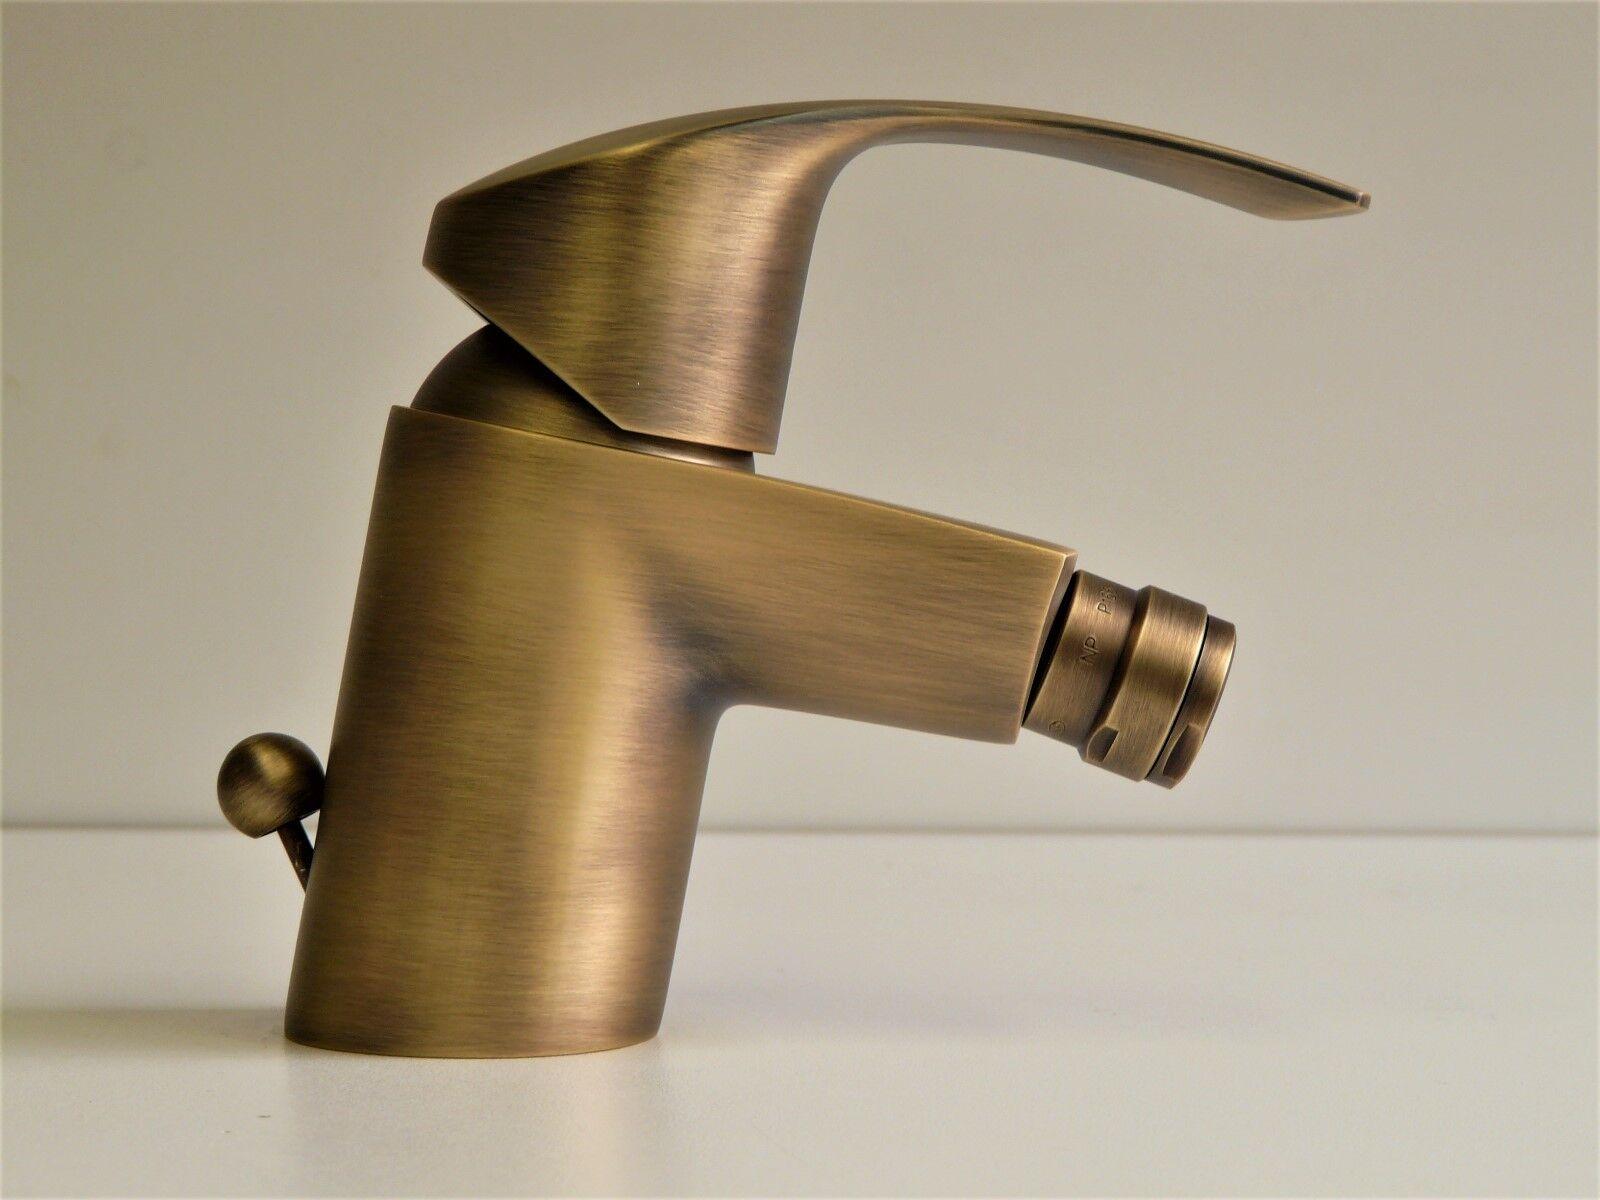 Grohe Eurosmart Bidetarmatur Bronze, Bidet-Einhebelmischer, Bidet, Bad